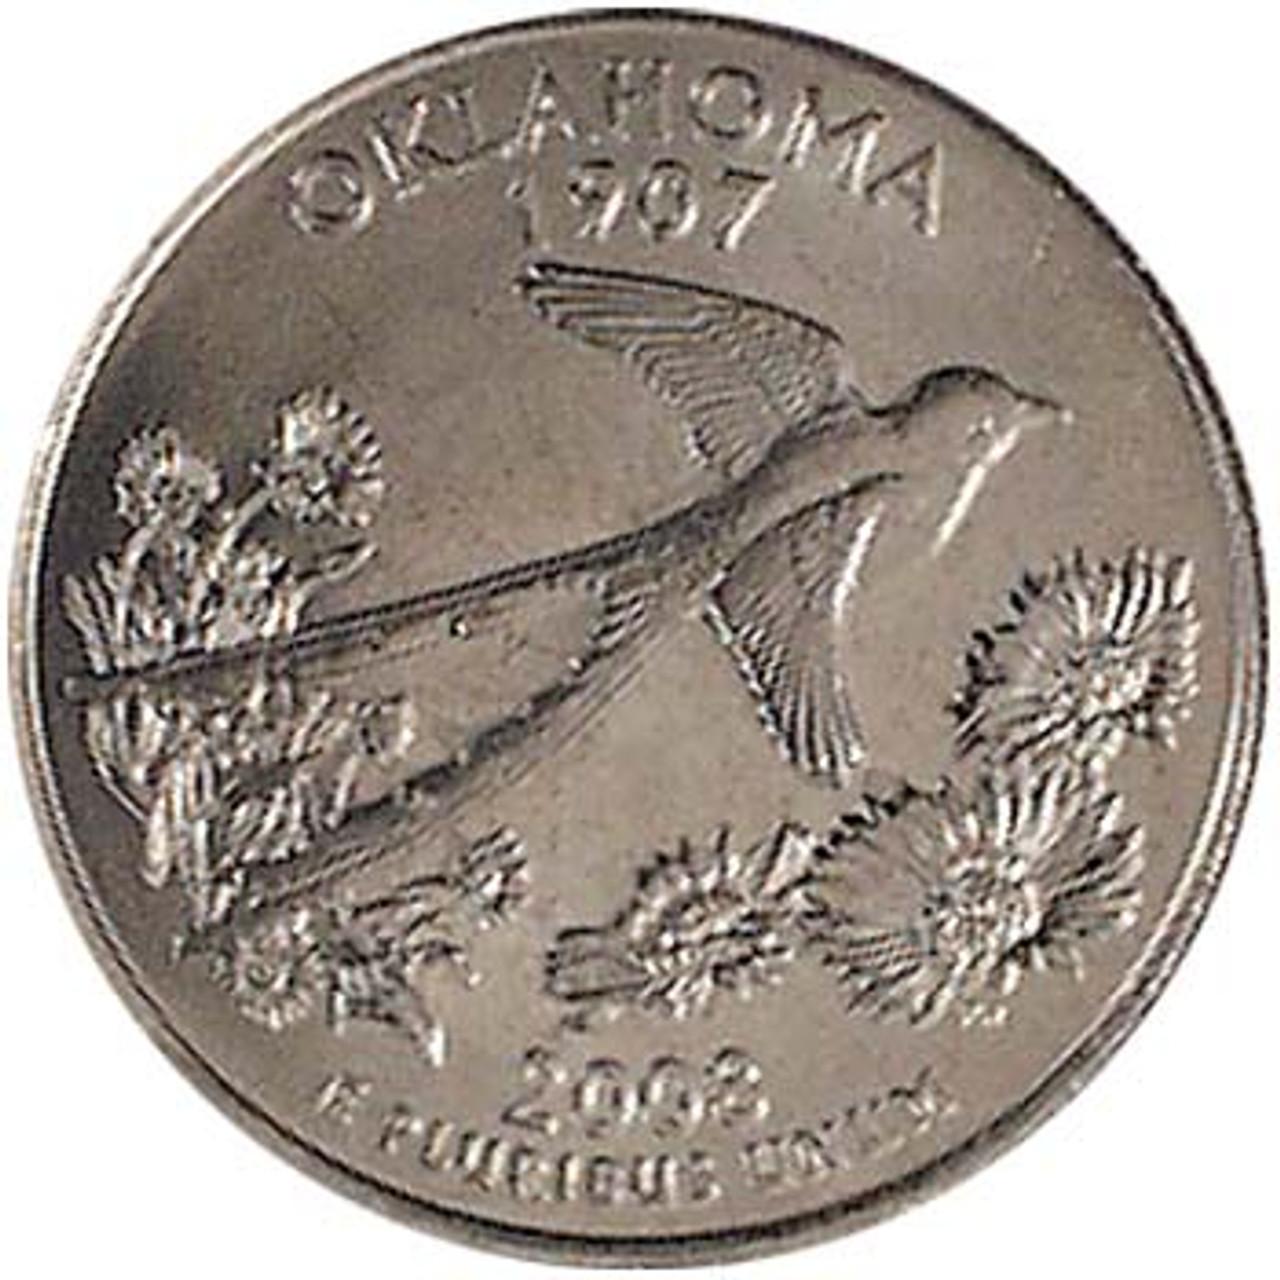 2008-P Oklahoma Quarter Brilliant Uncirculated Image 1